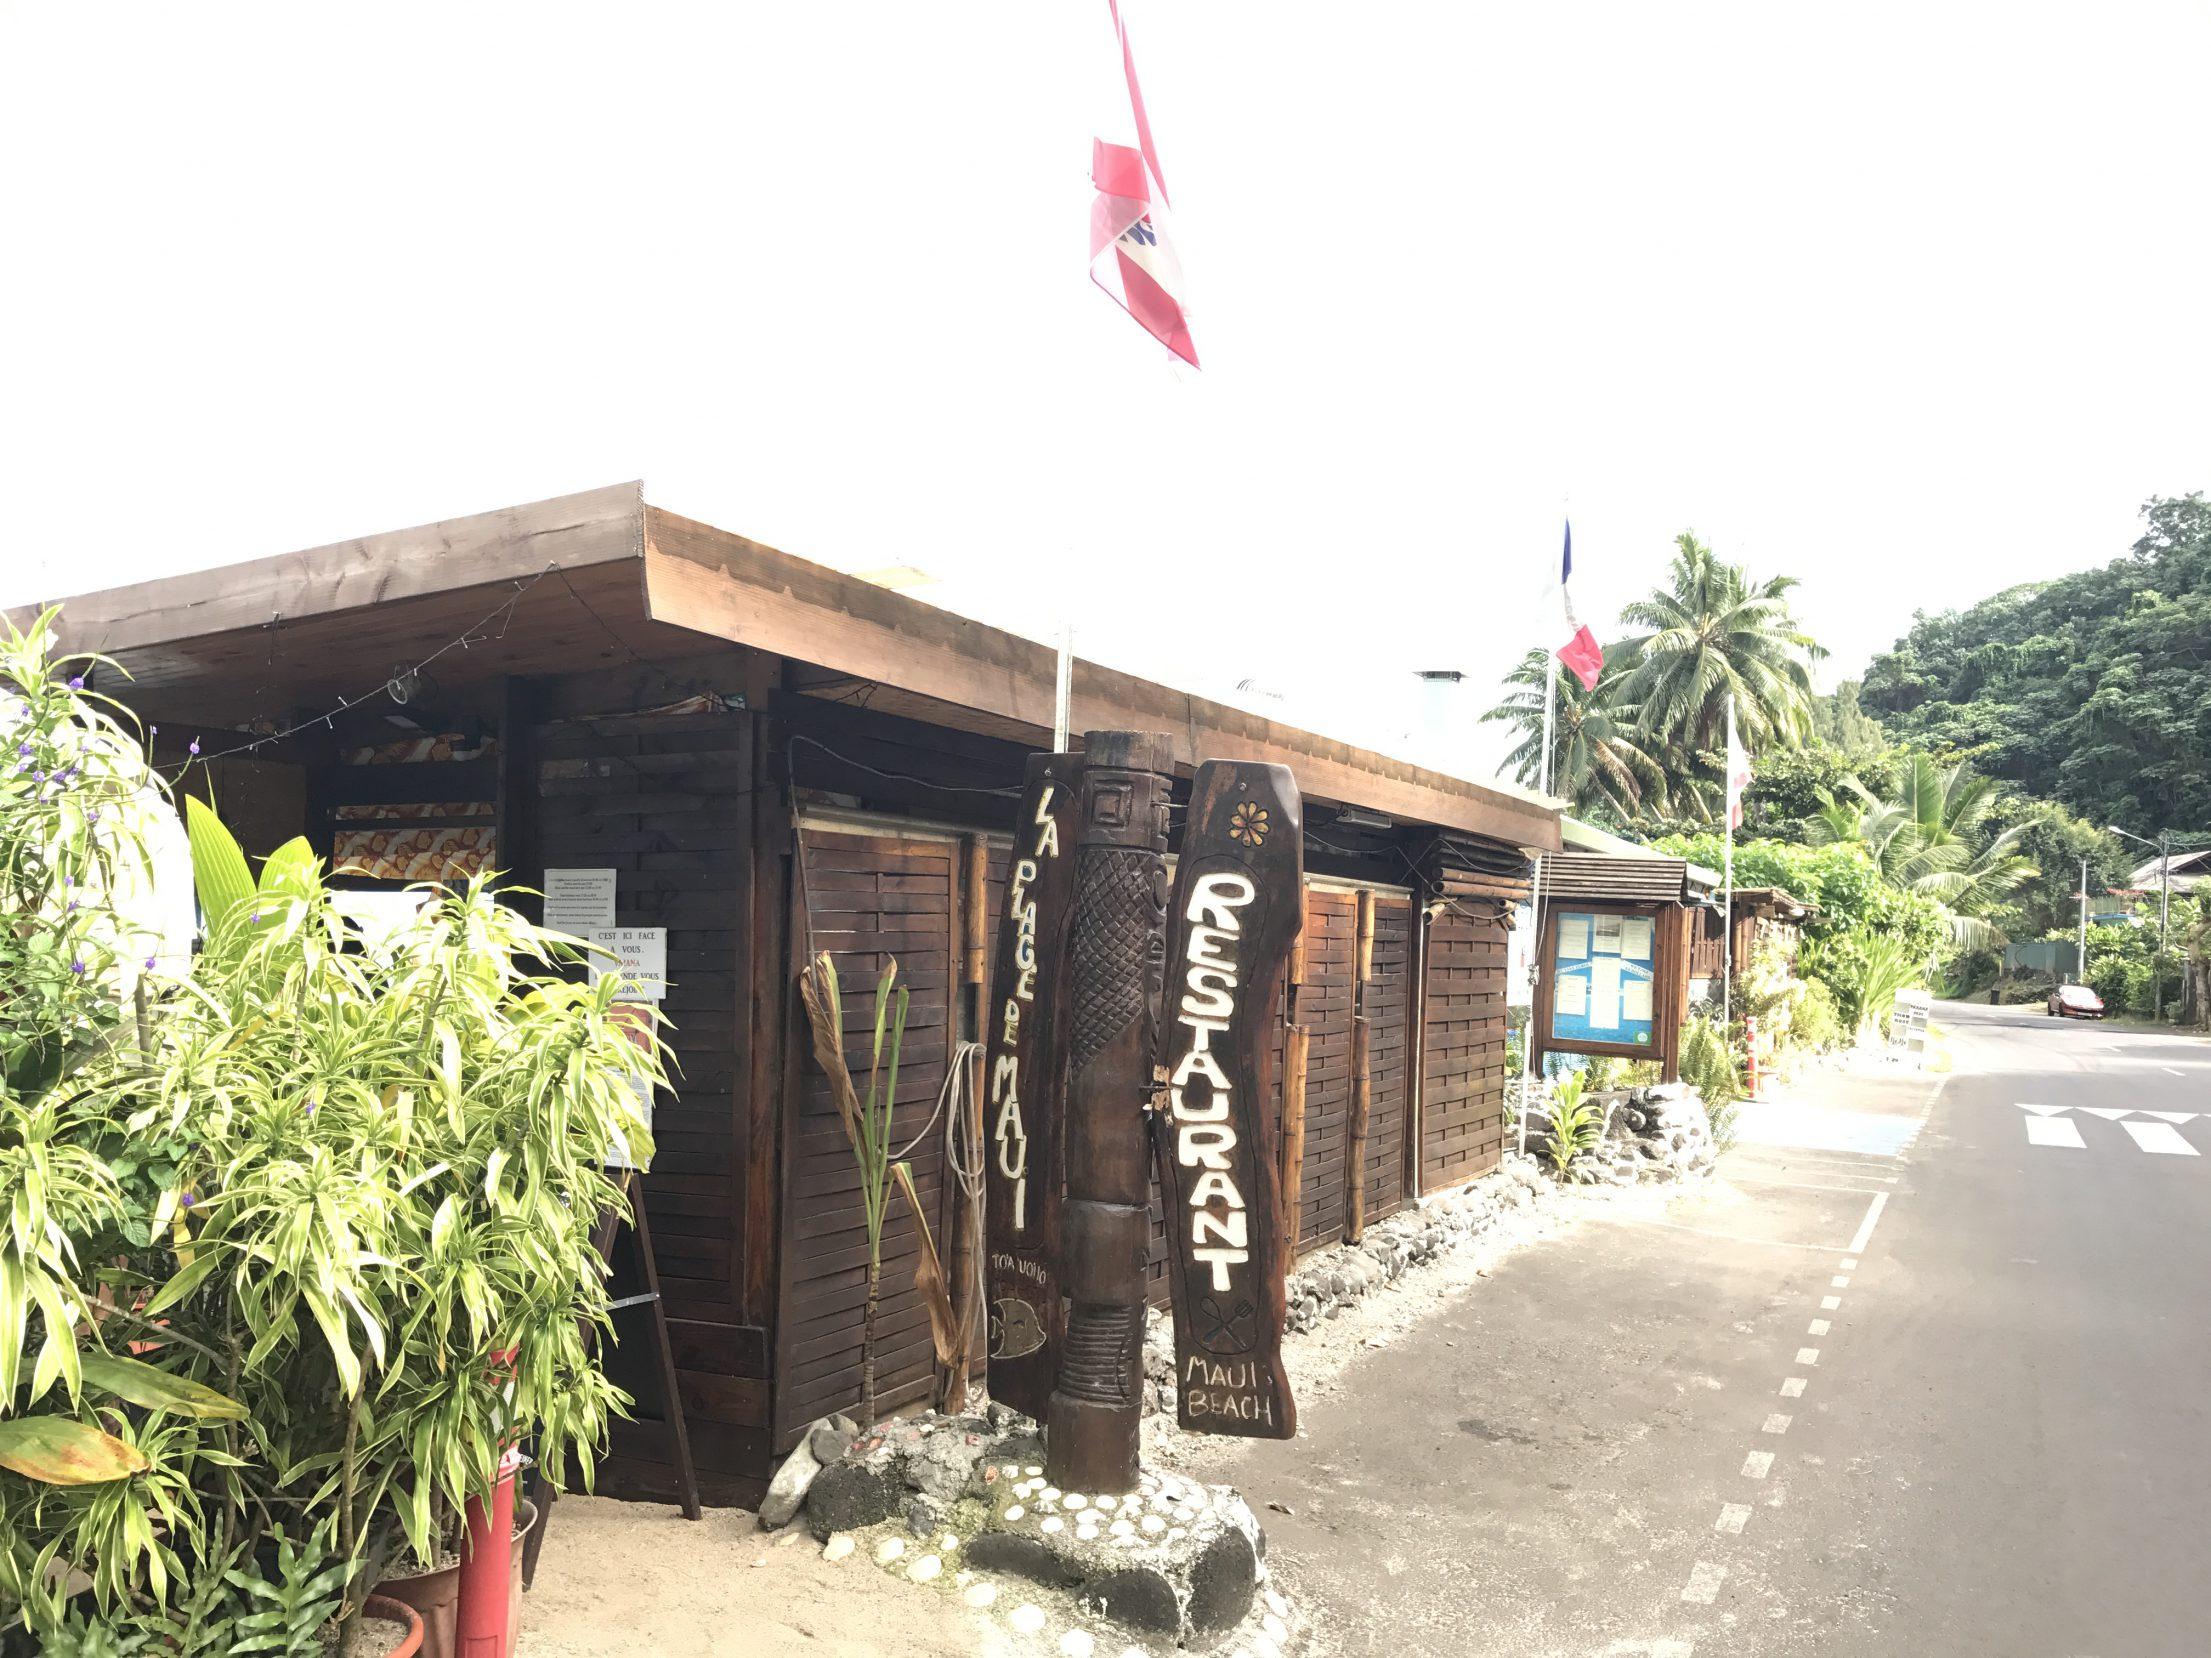 La Plage de Maui dinner, Tahiti